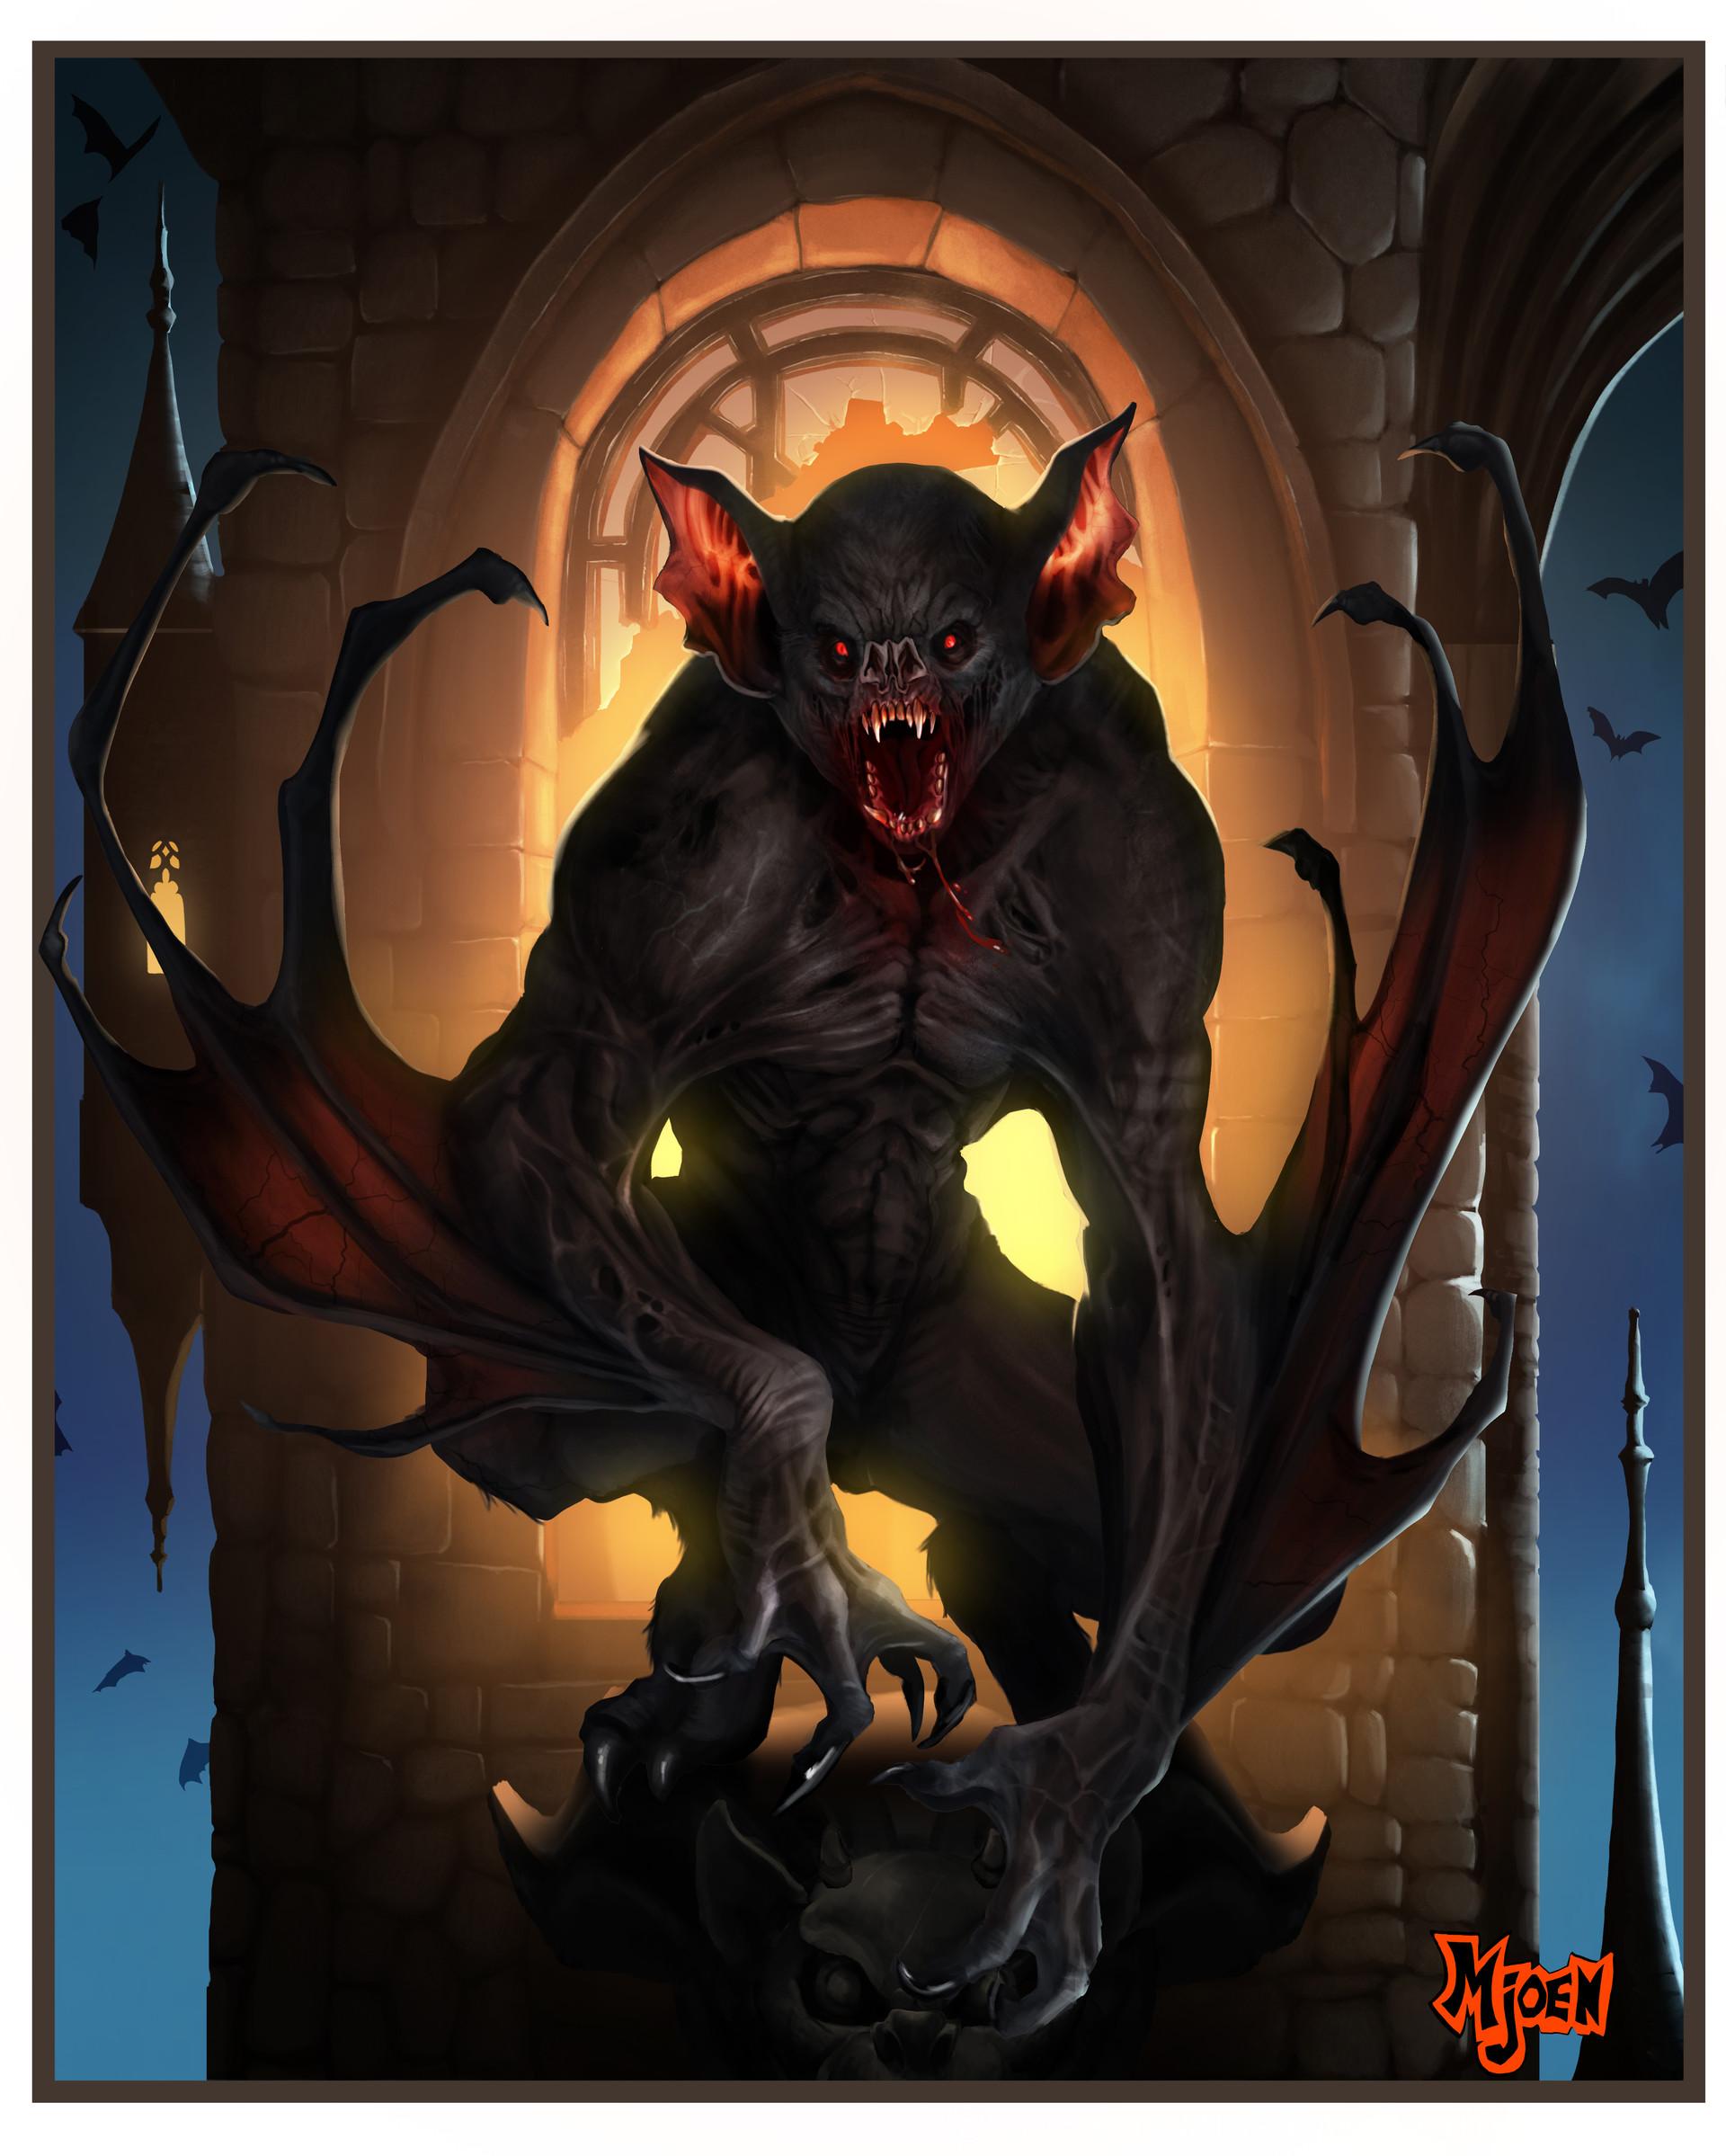 Kyle mjoen vampire bat monster